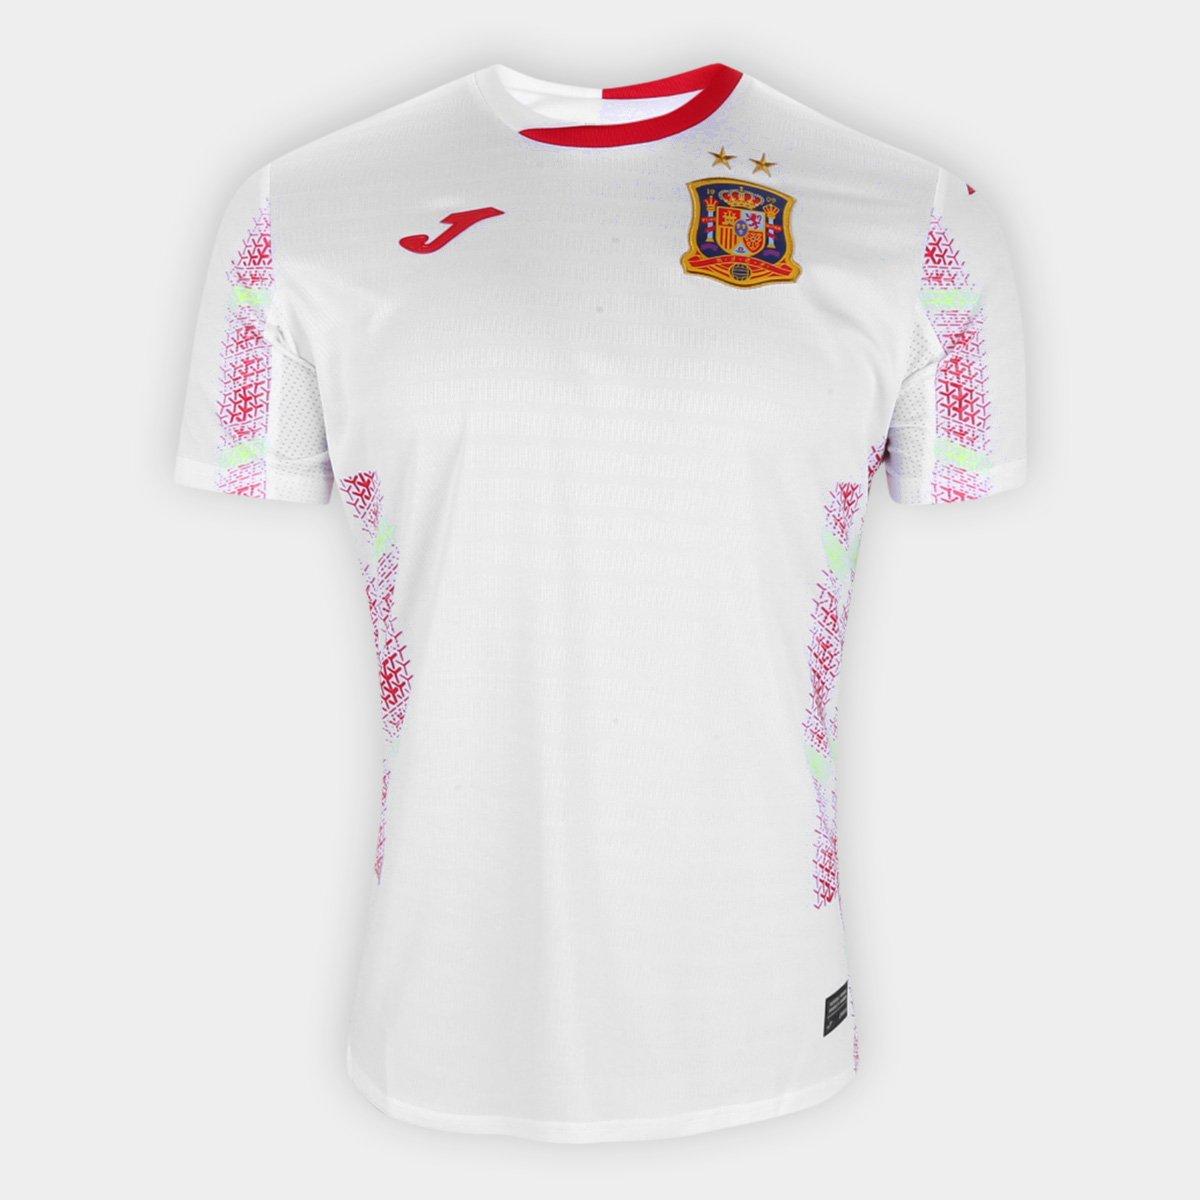 Camisa Seleção Espanha Futsal Away 20/21 s/n° Torcedor Joma Masculina